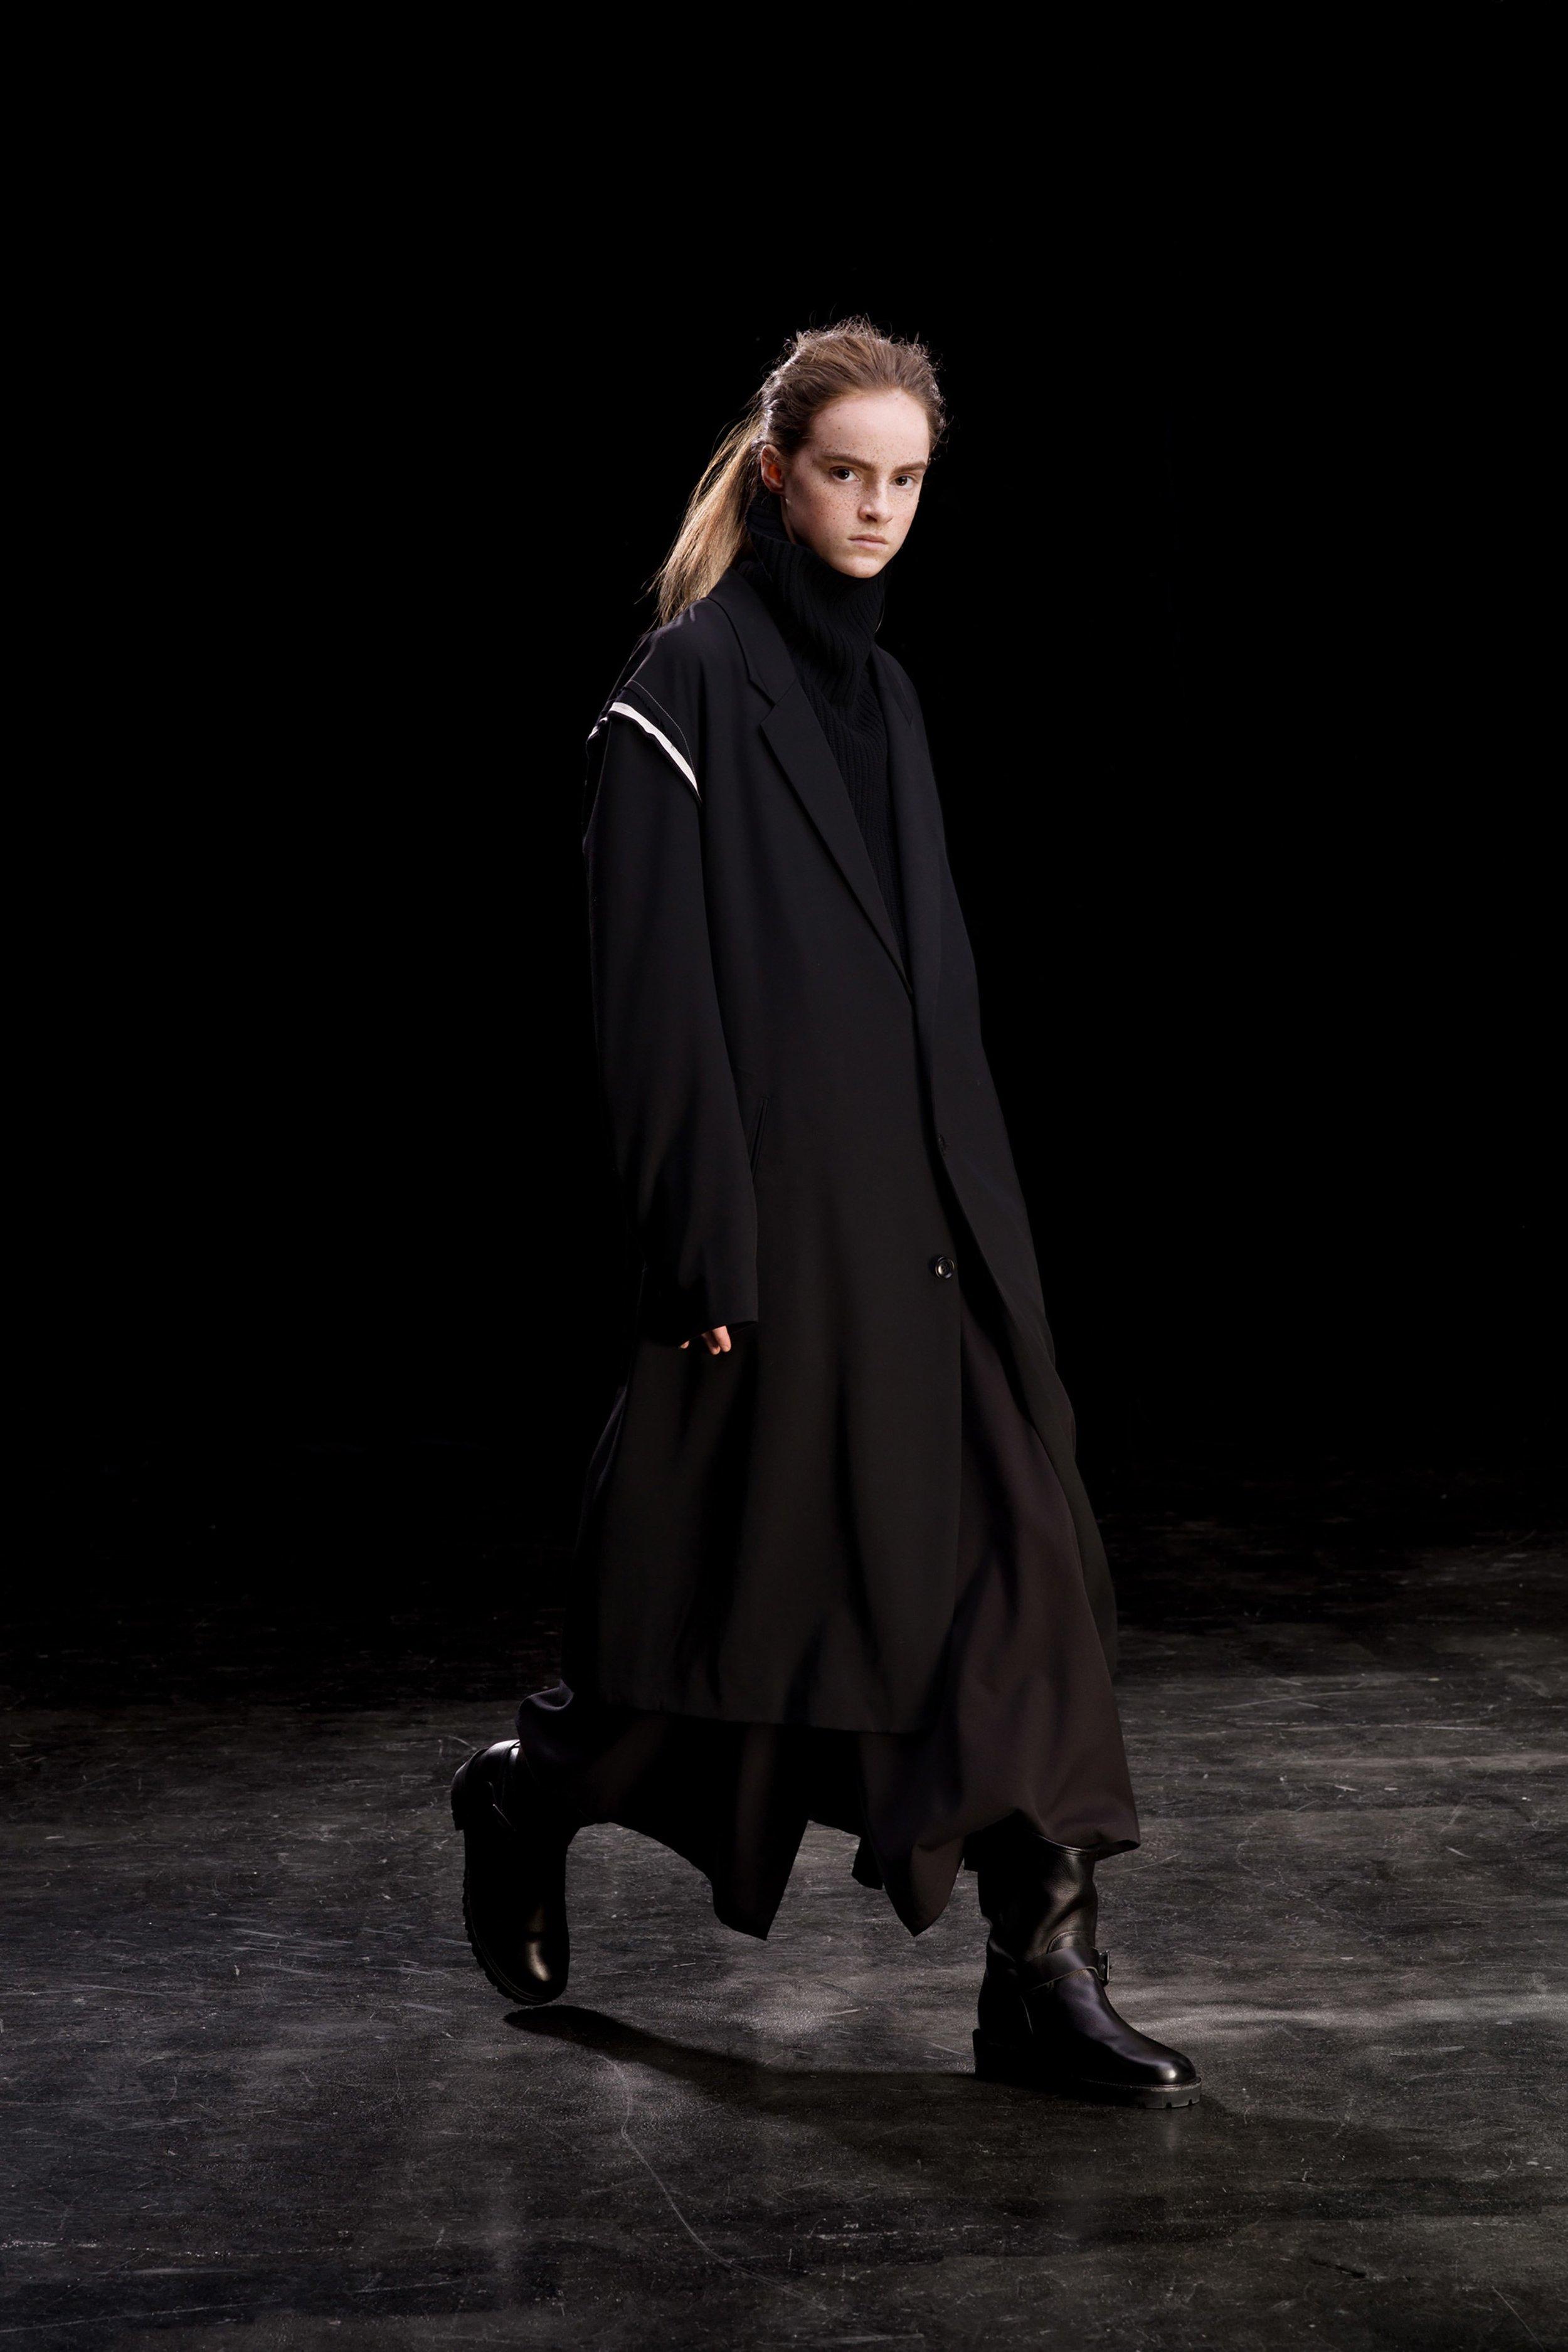 00005-Ys-Yohji-Yamamoto-FALL-19-Ready-To-Wear.jpg